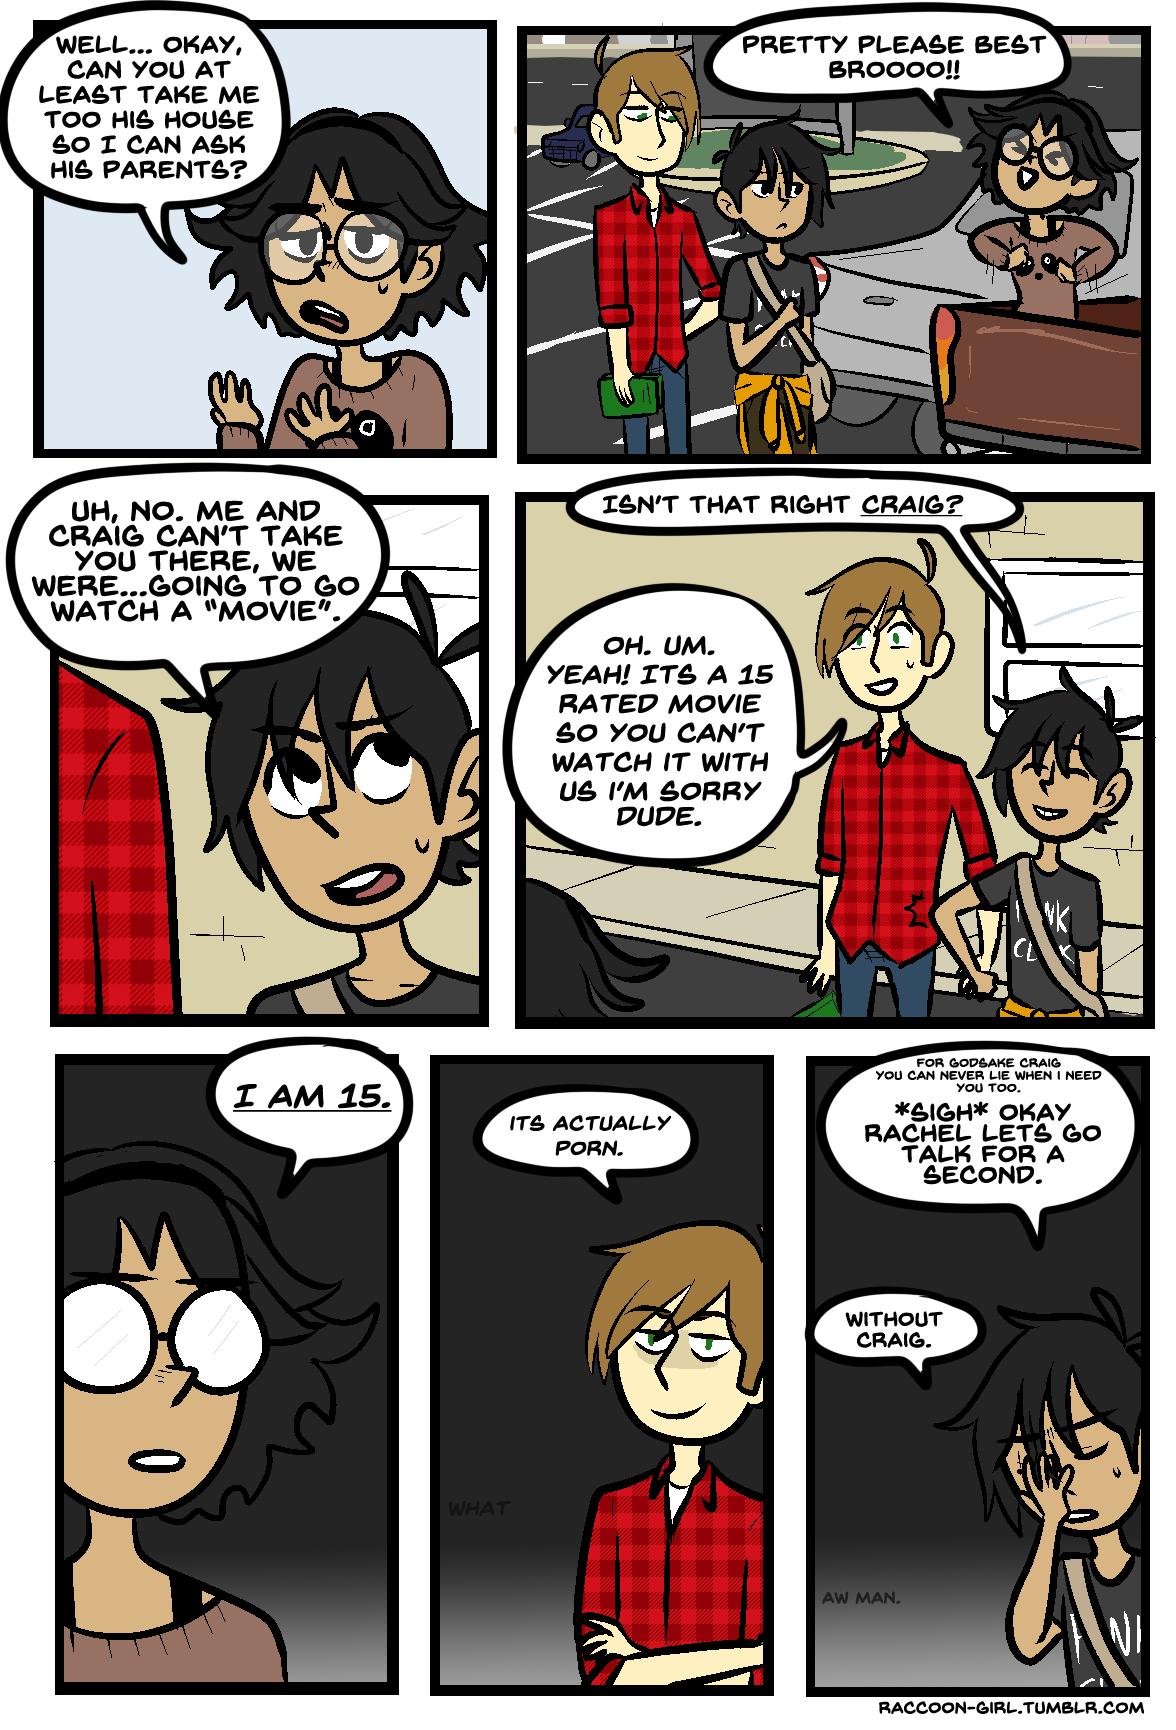 raccoongirl-page22